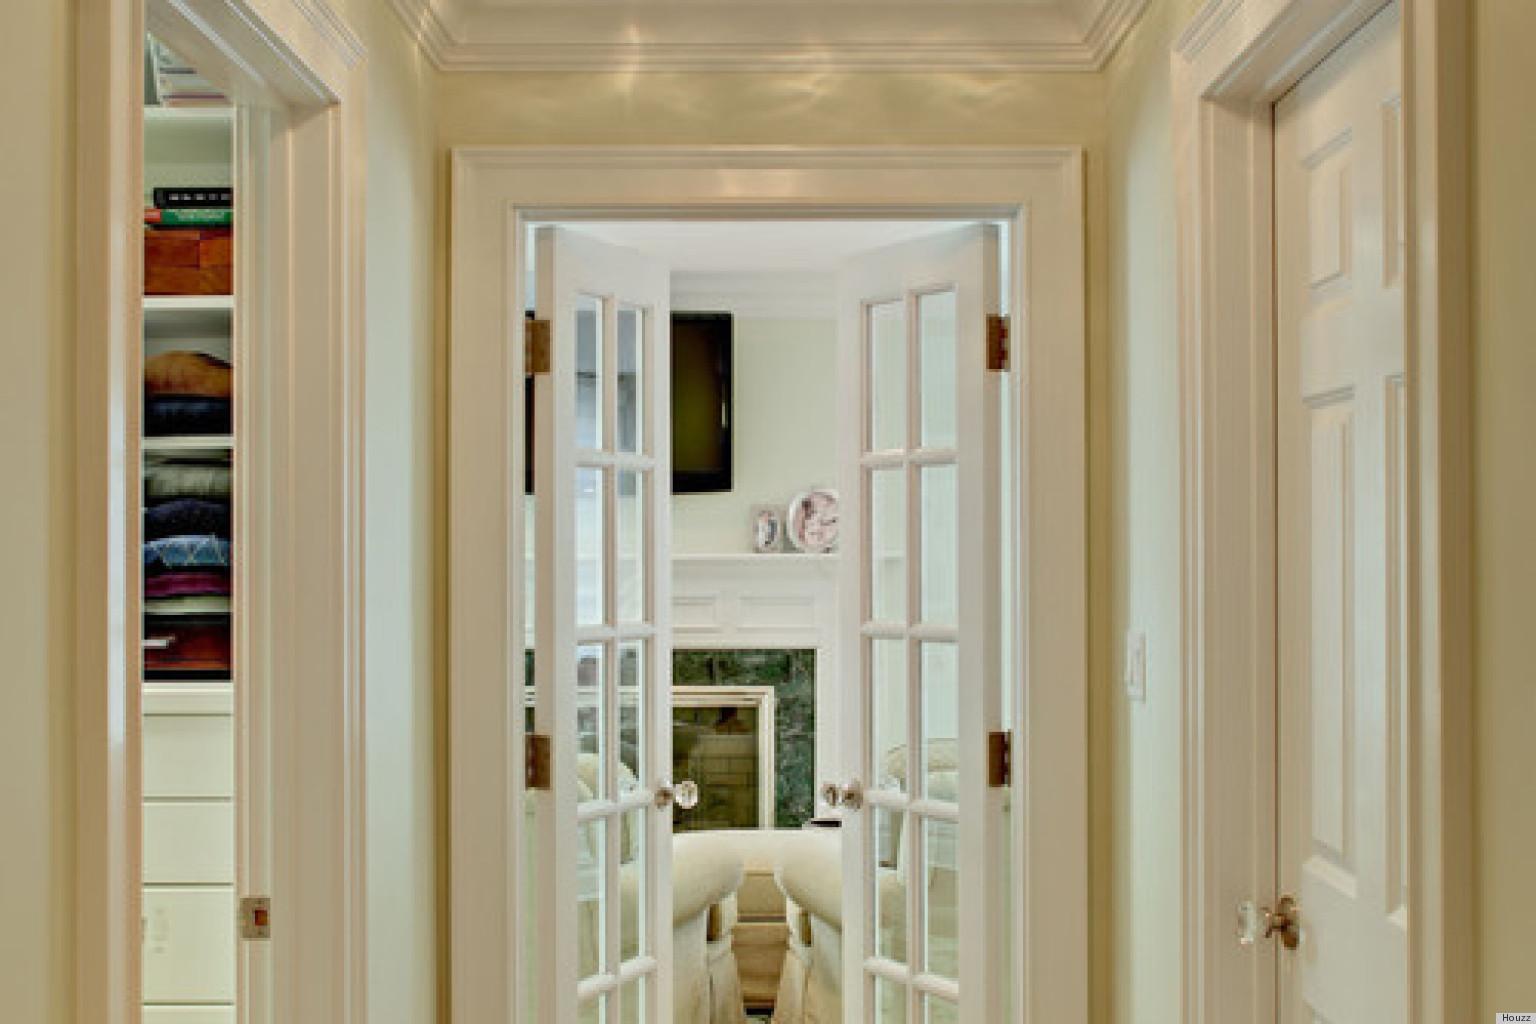 french-doors-interior-design-ideas-photo-6